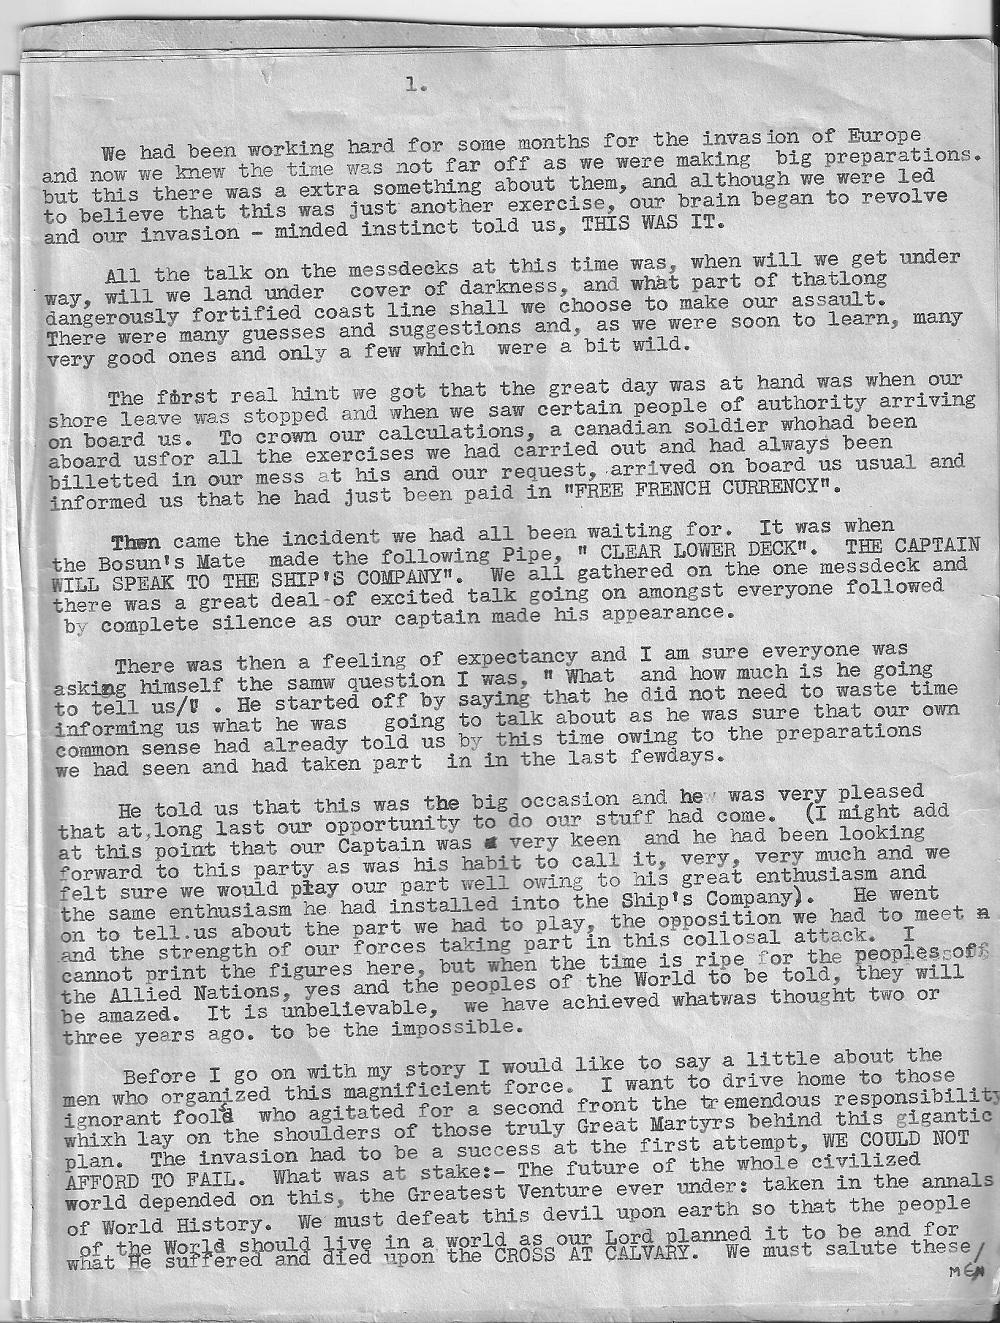 Bill Honeyman D-Day letter page 1